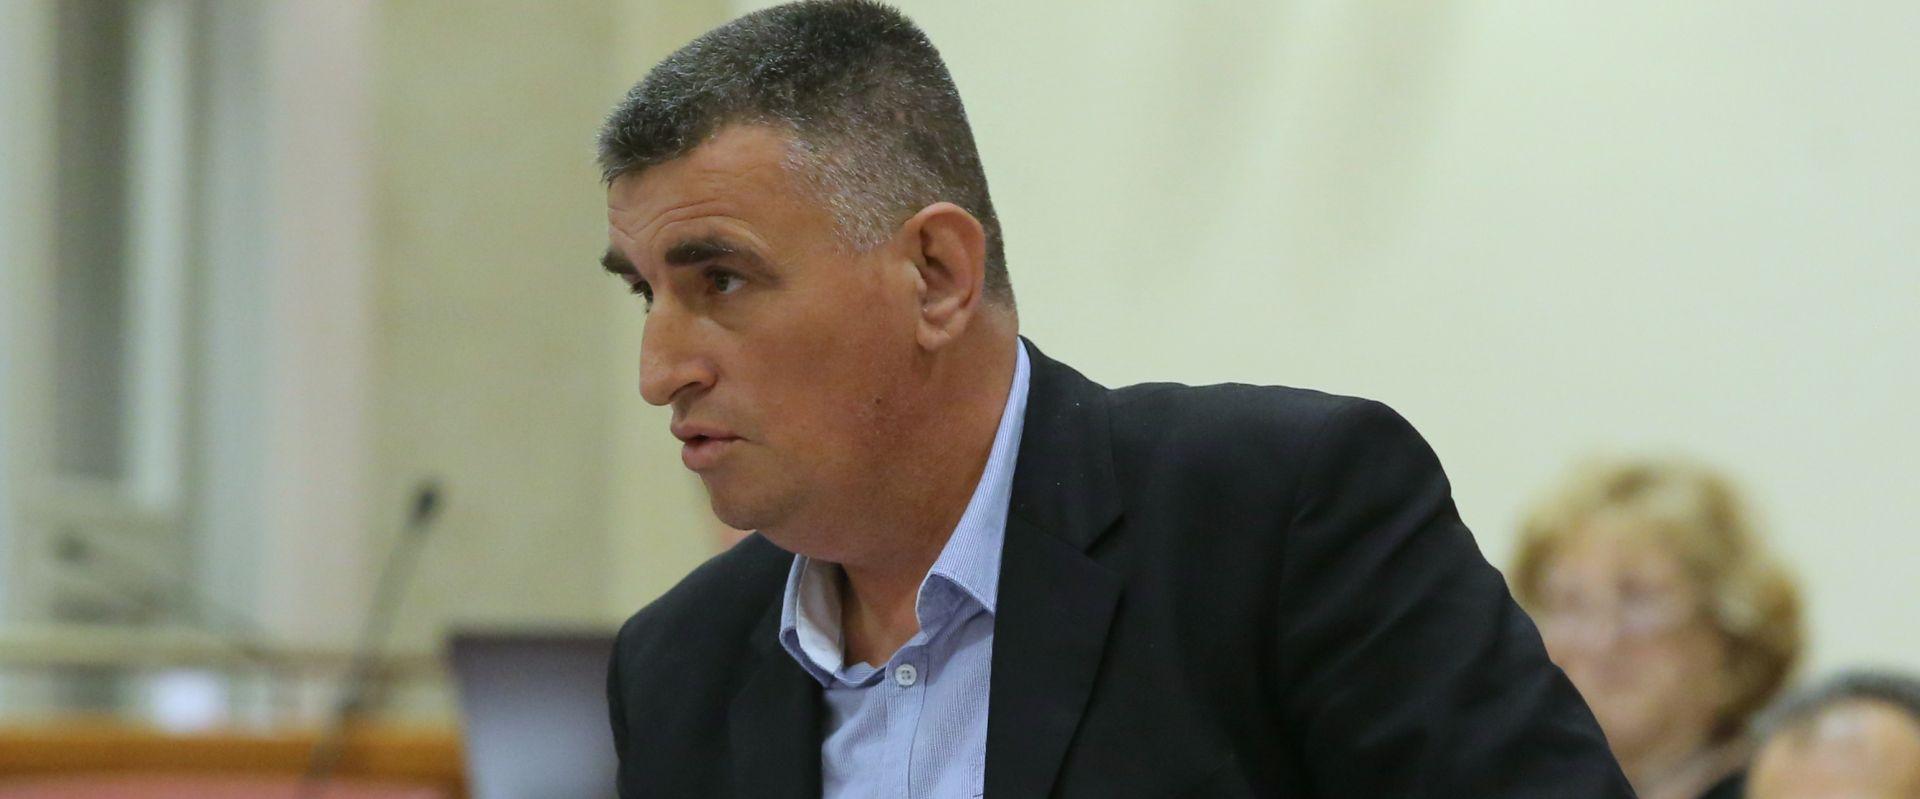 Bulj: Jakovina je odgovoran za stopiranje poljoprivrednih poticaja